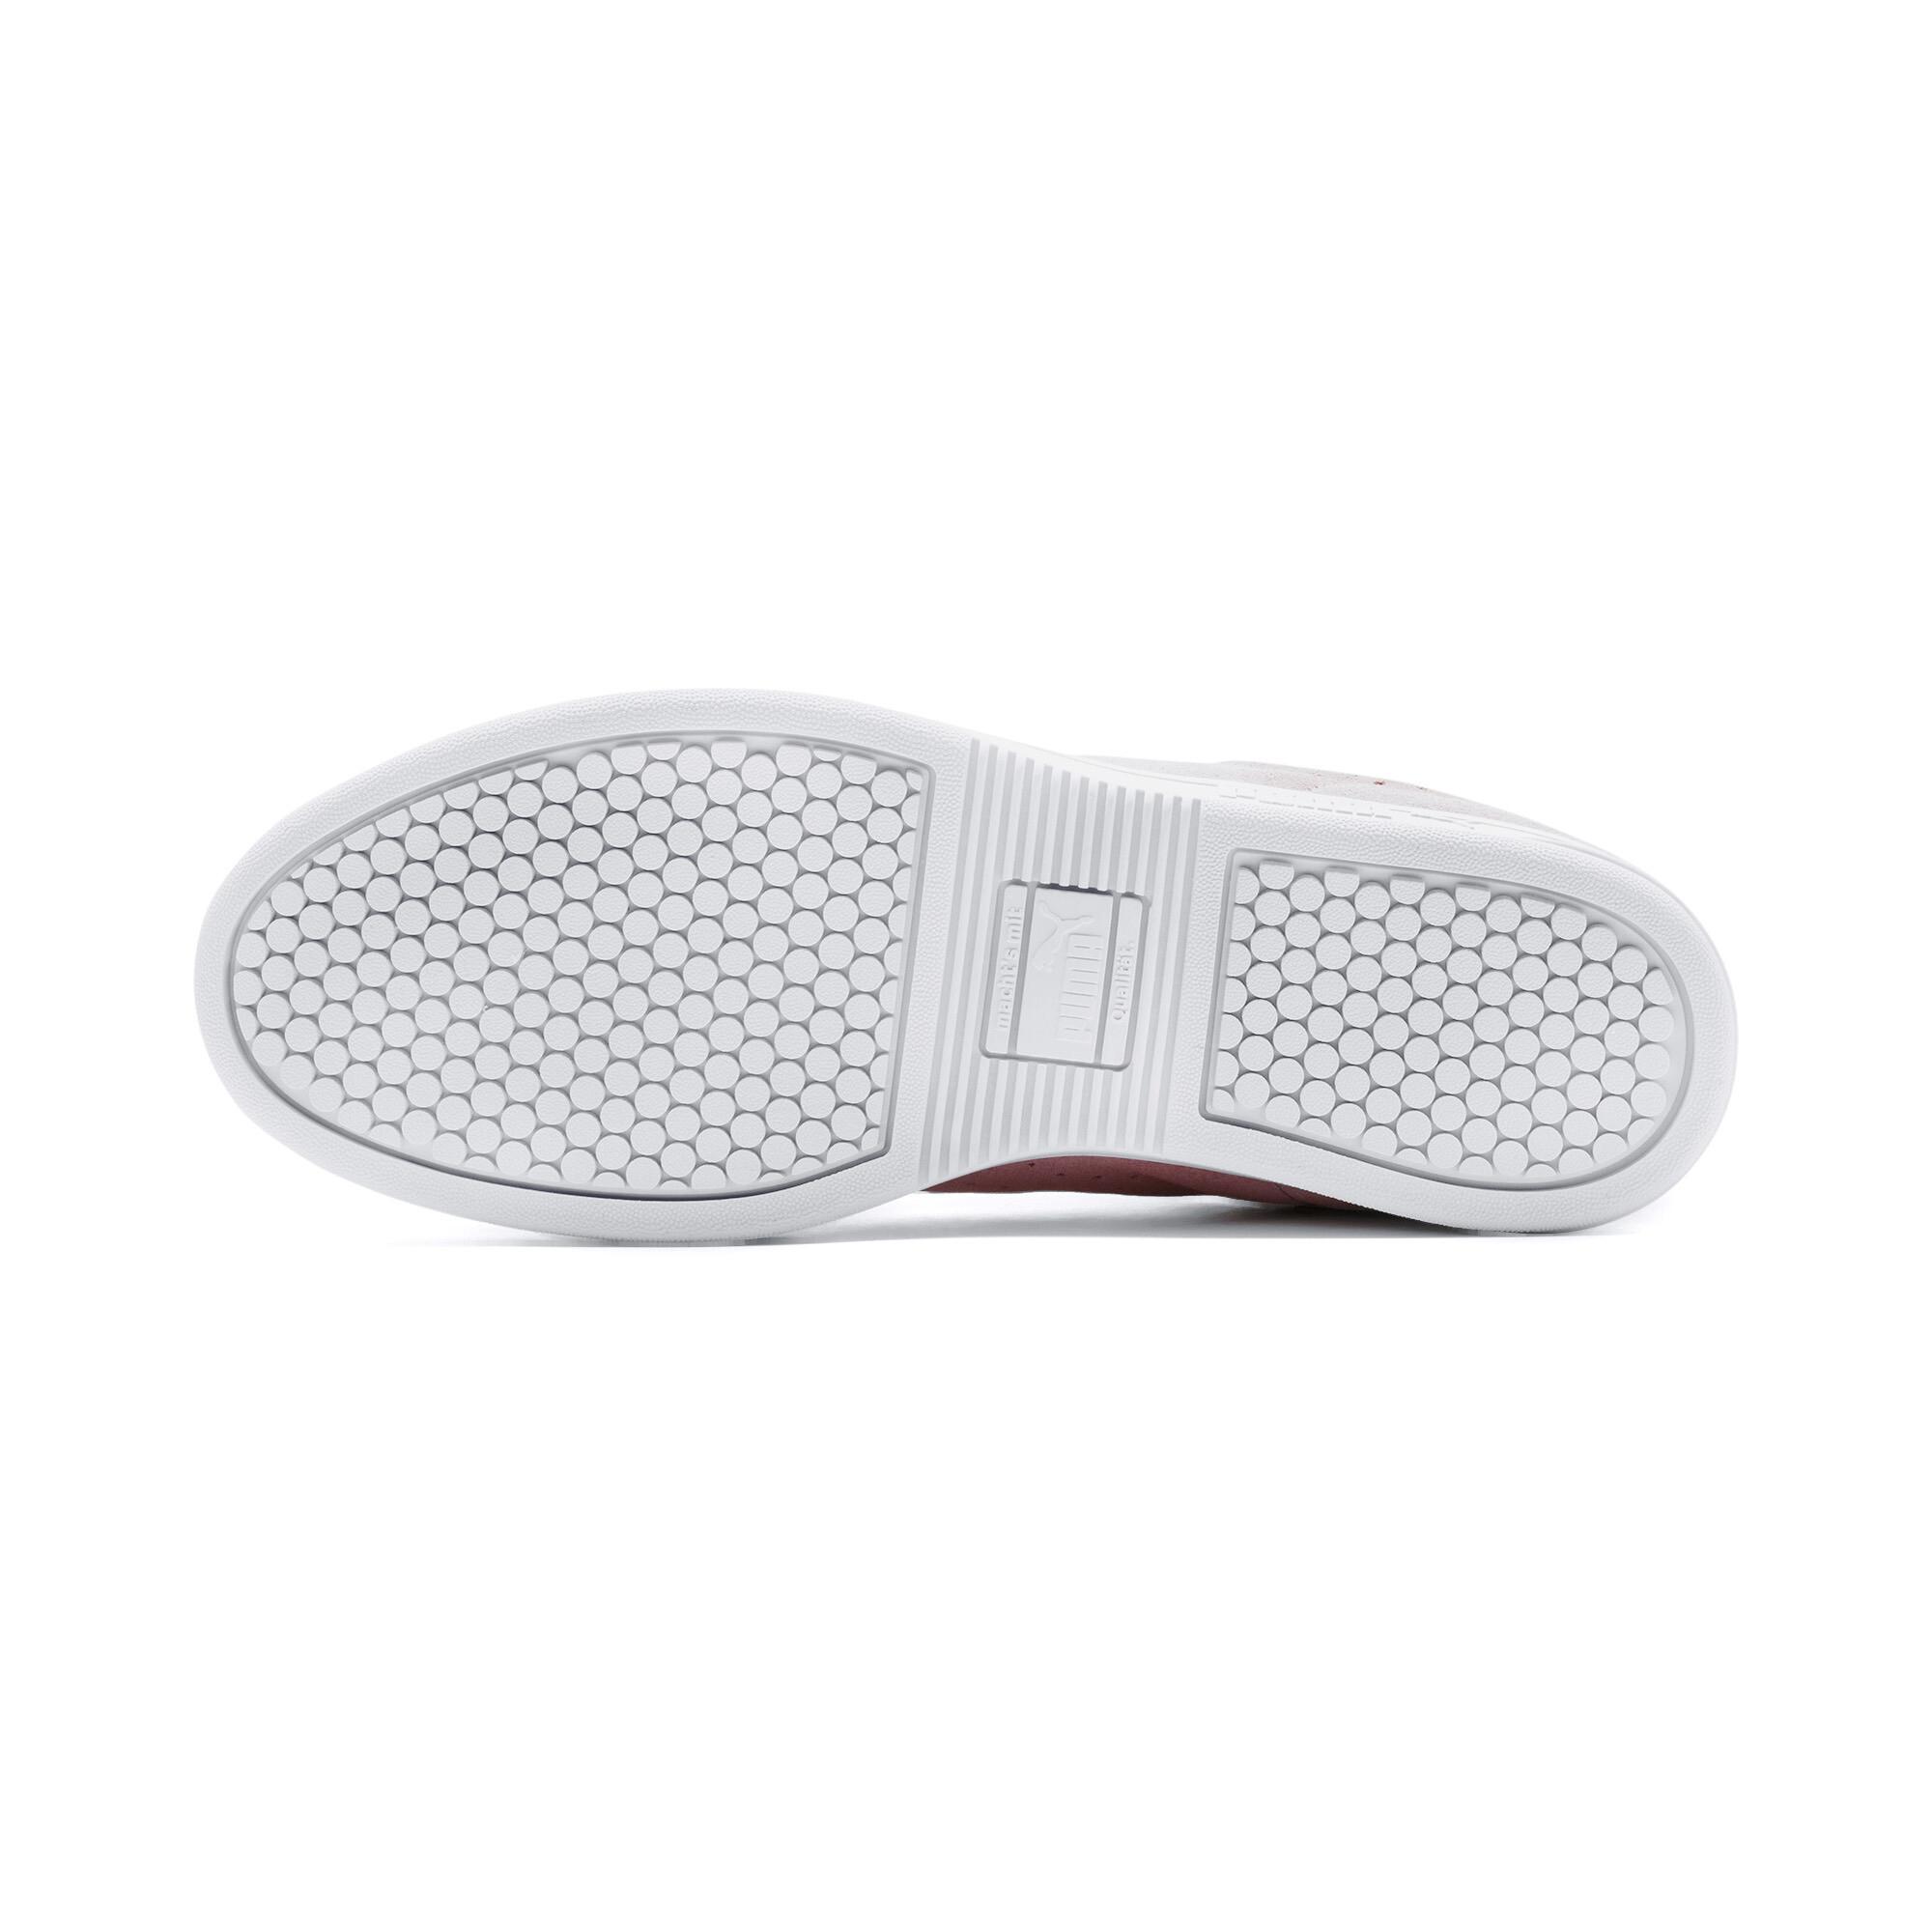 PUMA-Court-Star-Suede-Sneakers-Unisex-Shoe-Sport-Classics thumbnail 6